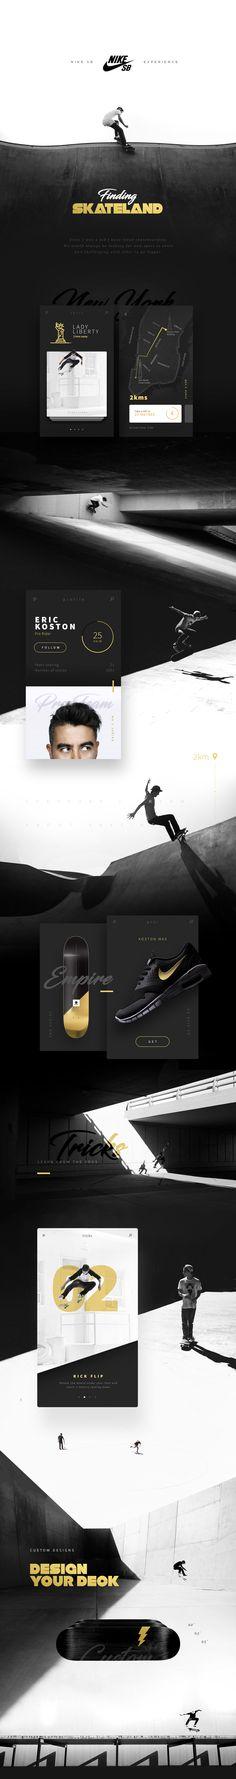 Nike SB Concept